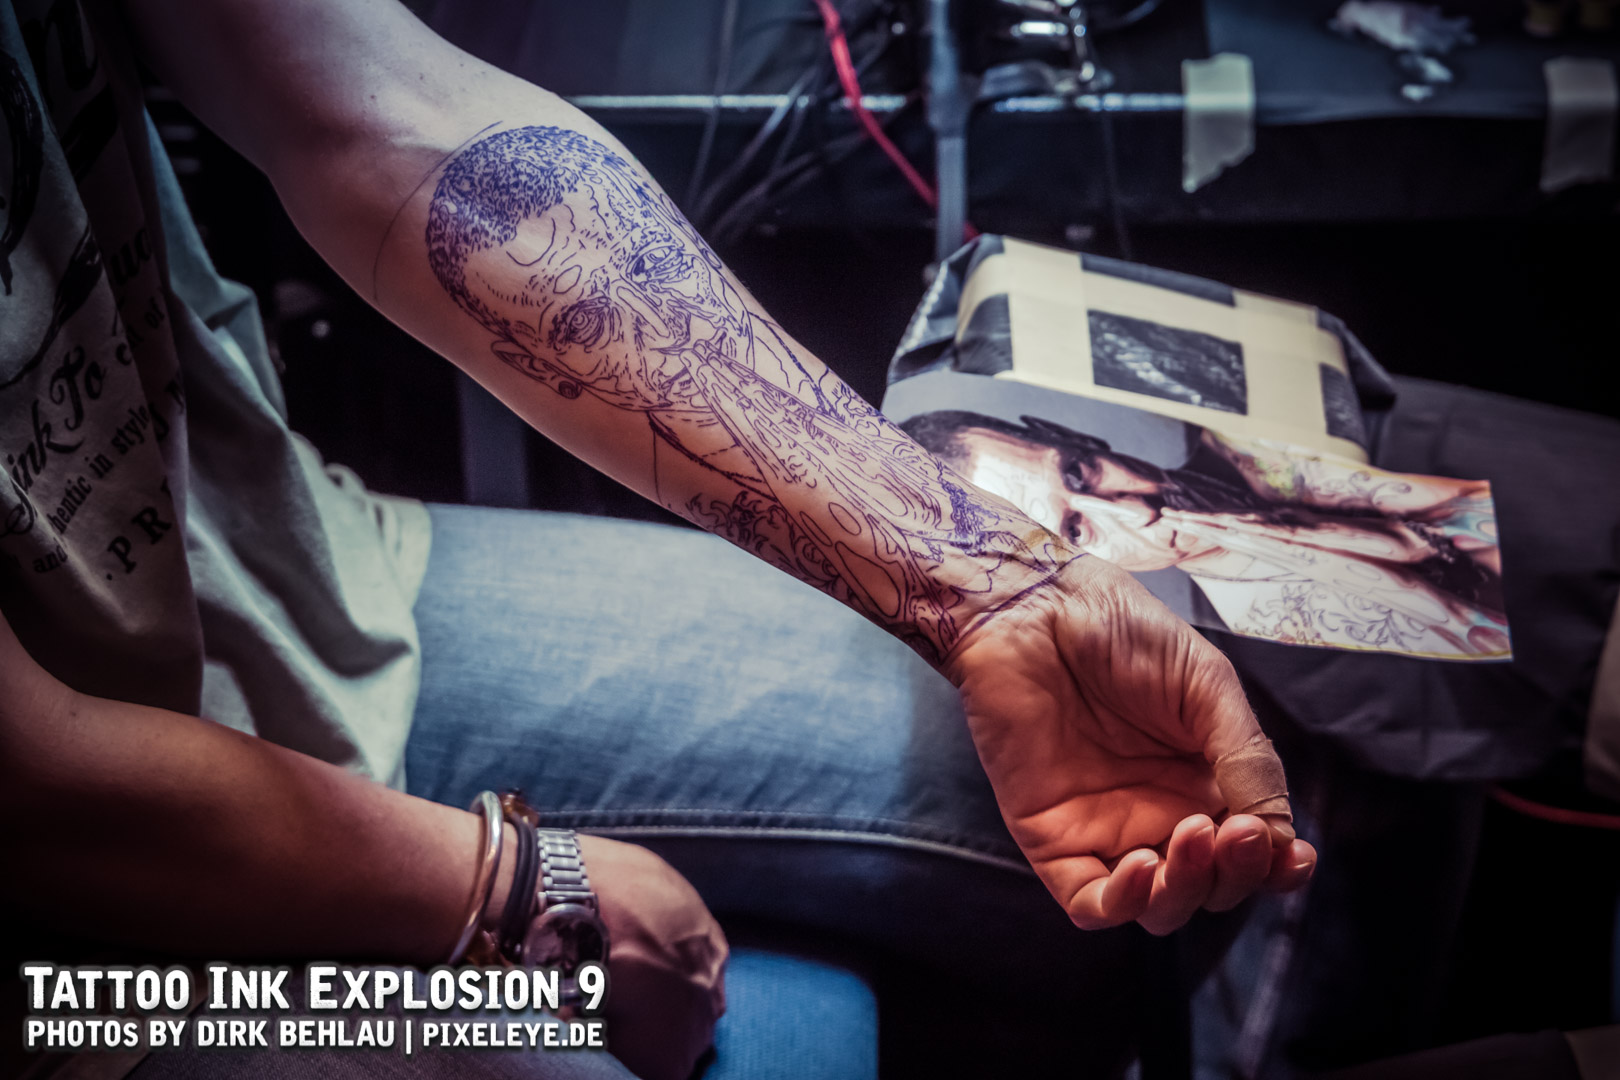 Tattoo Ink Explosion 2018 WEB by Dirk Behlau-0478.jpg